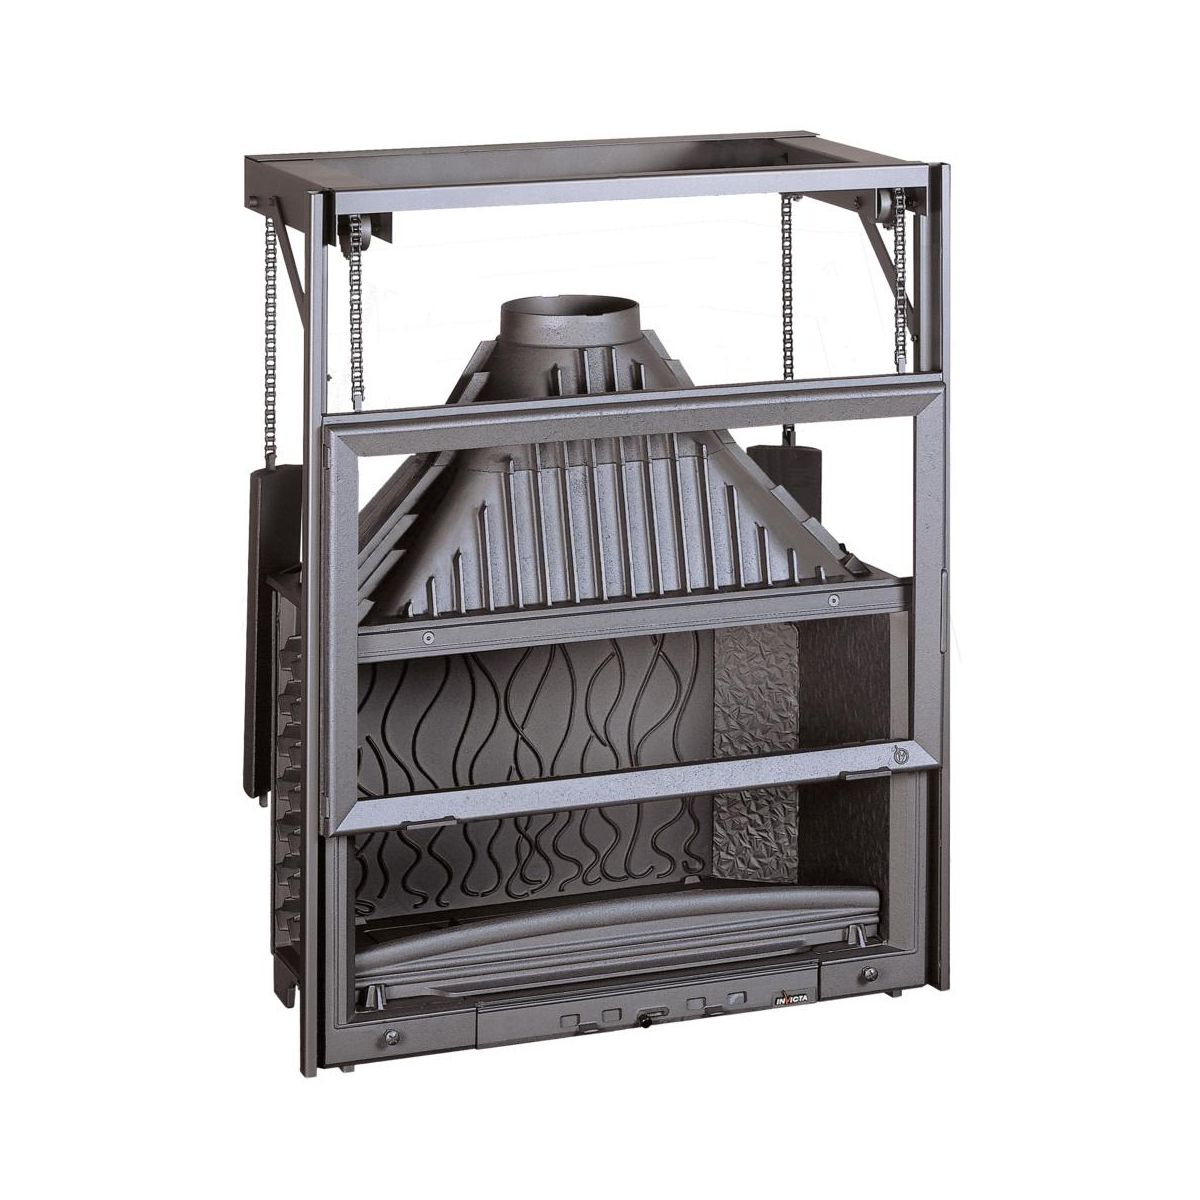 wk ad kominkowy 900 grande vision podnoszony invicta. Black Bedroom Furniture Sets. Home Design Ideas